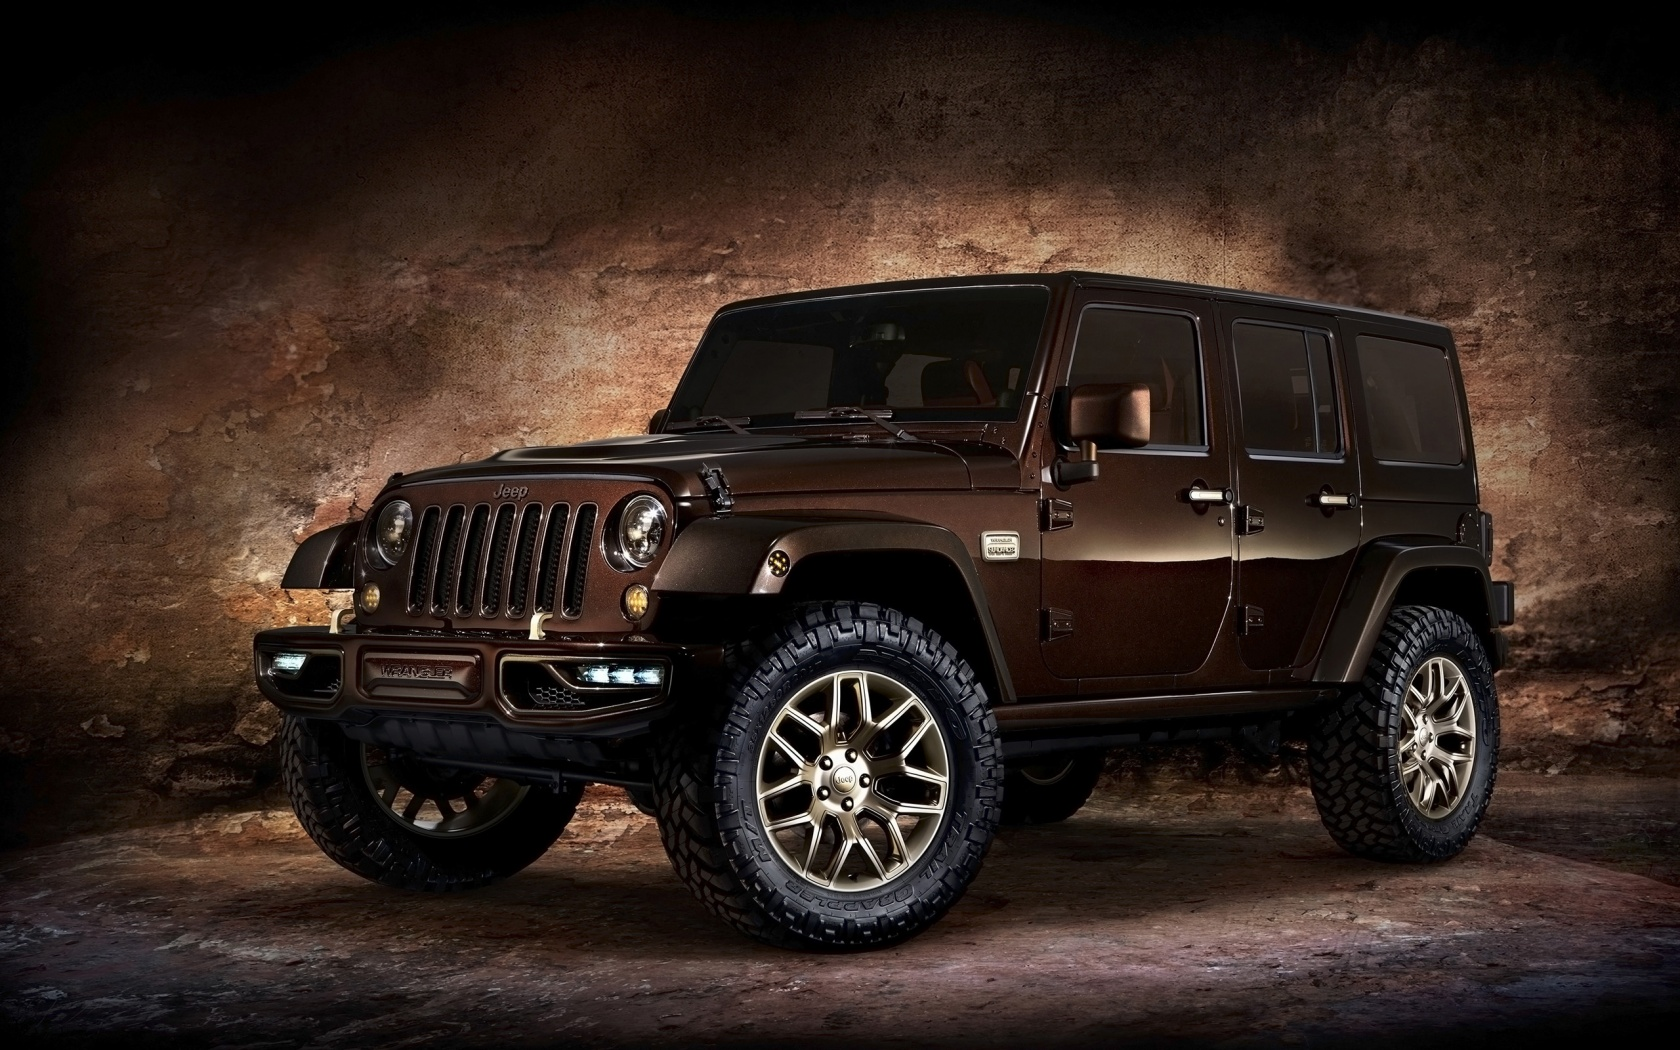 2014 Jeep Wrangler Sundancer Concept Wallpaper HD Car Wallpapers 1680x1050